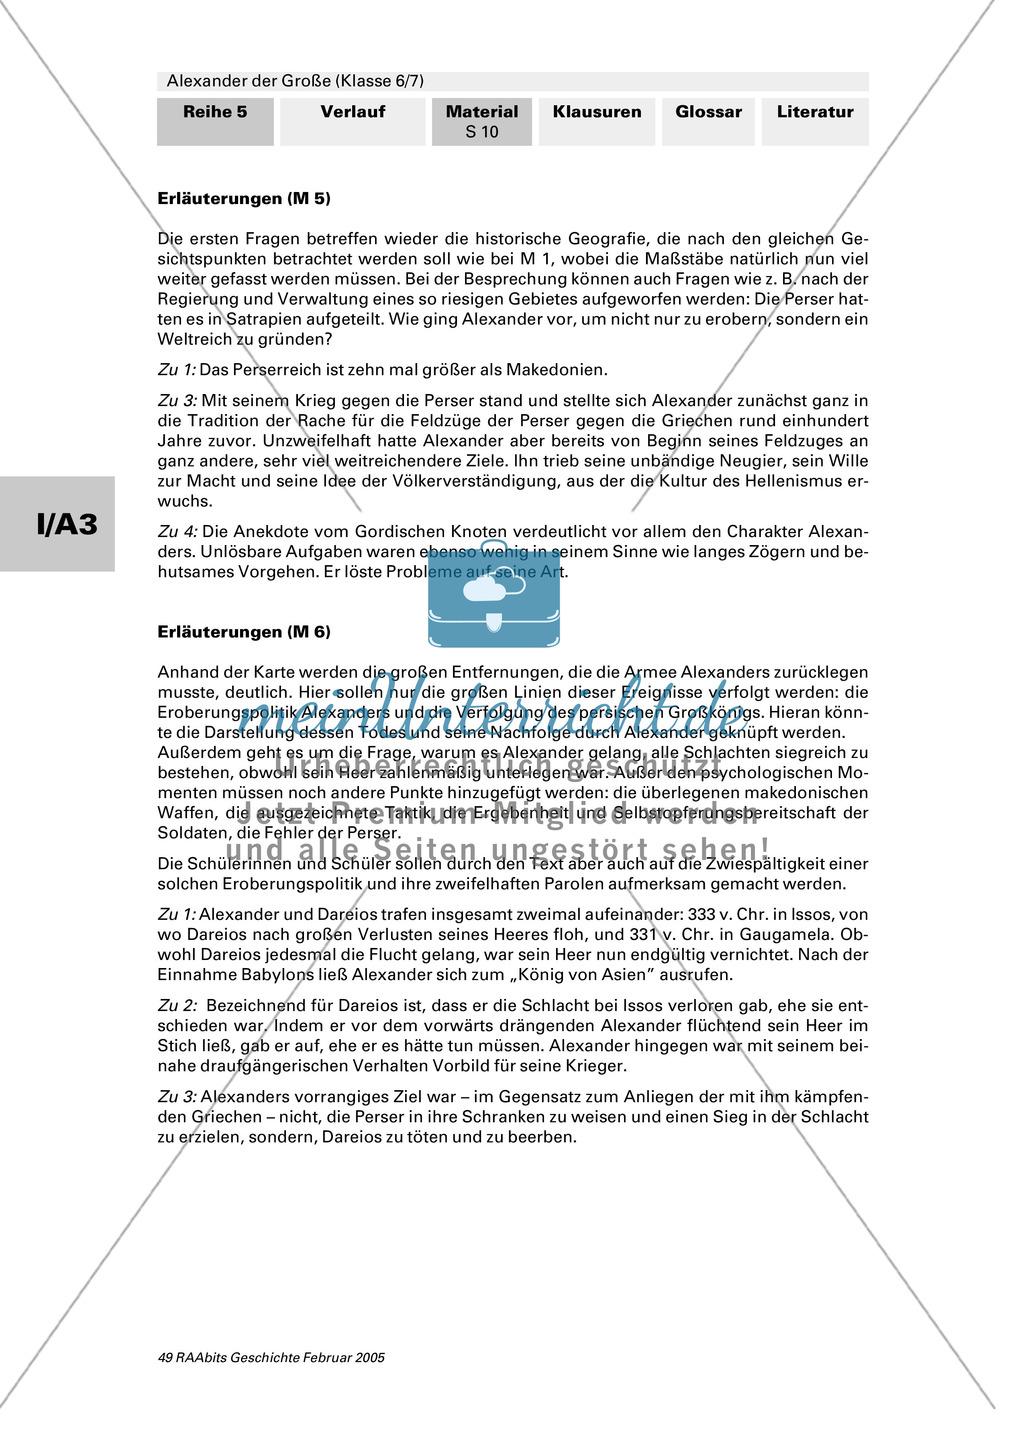 Alexander der Große: Eroberungsfeldzüge an Autorentexten, Karten, Bildern Preview 6